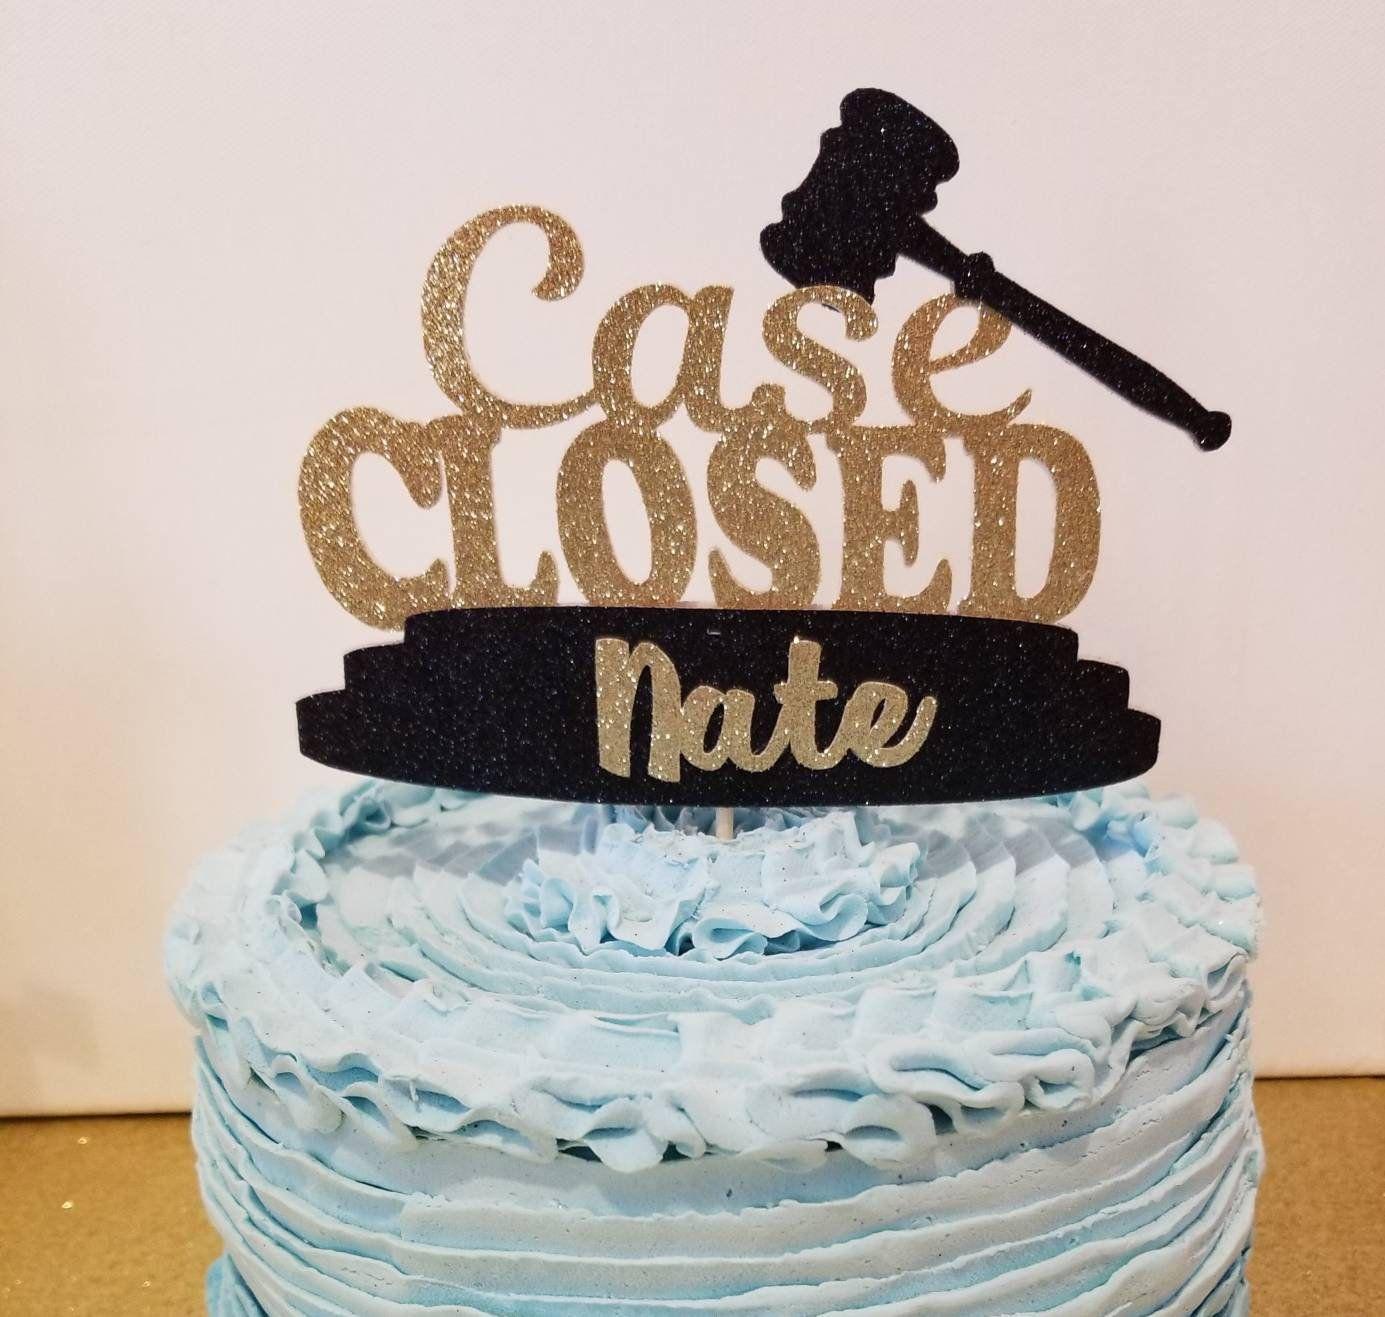 Case Closed Cake Topper Lawyer Retirement Party Law School Graduation